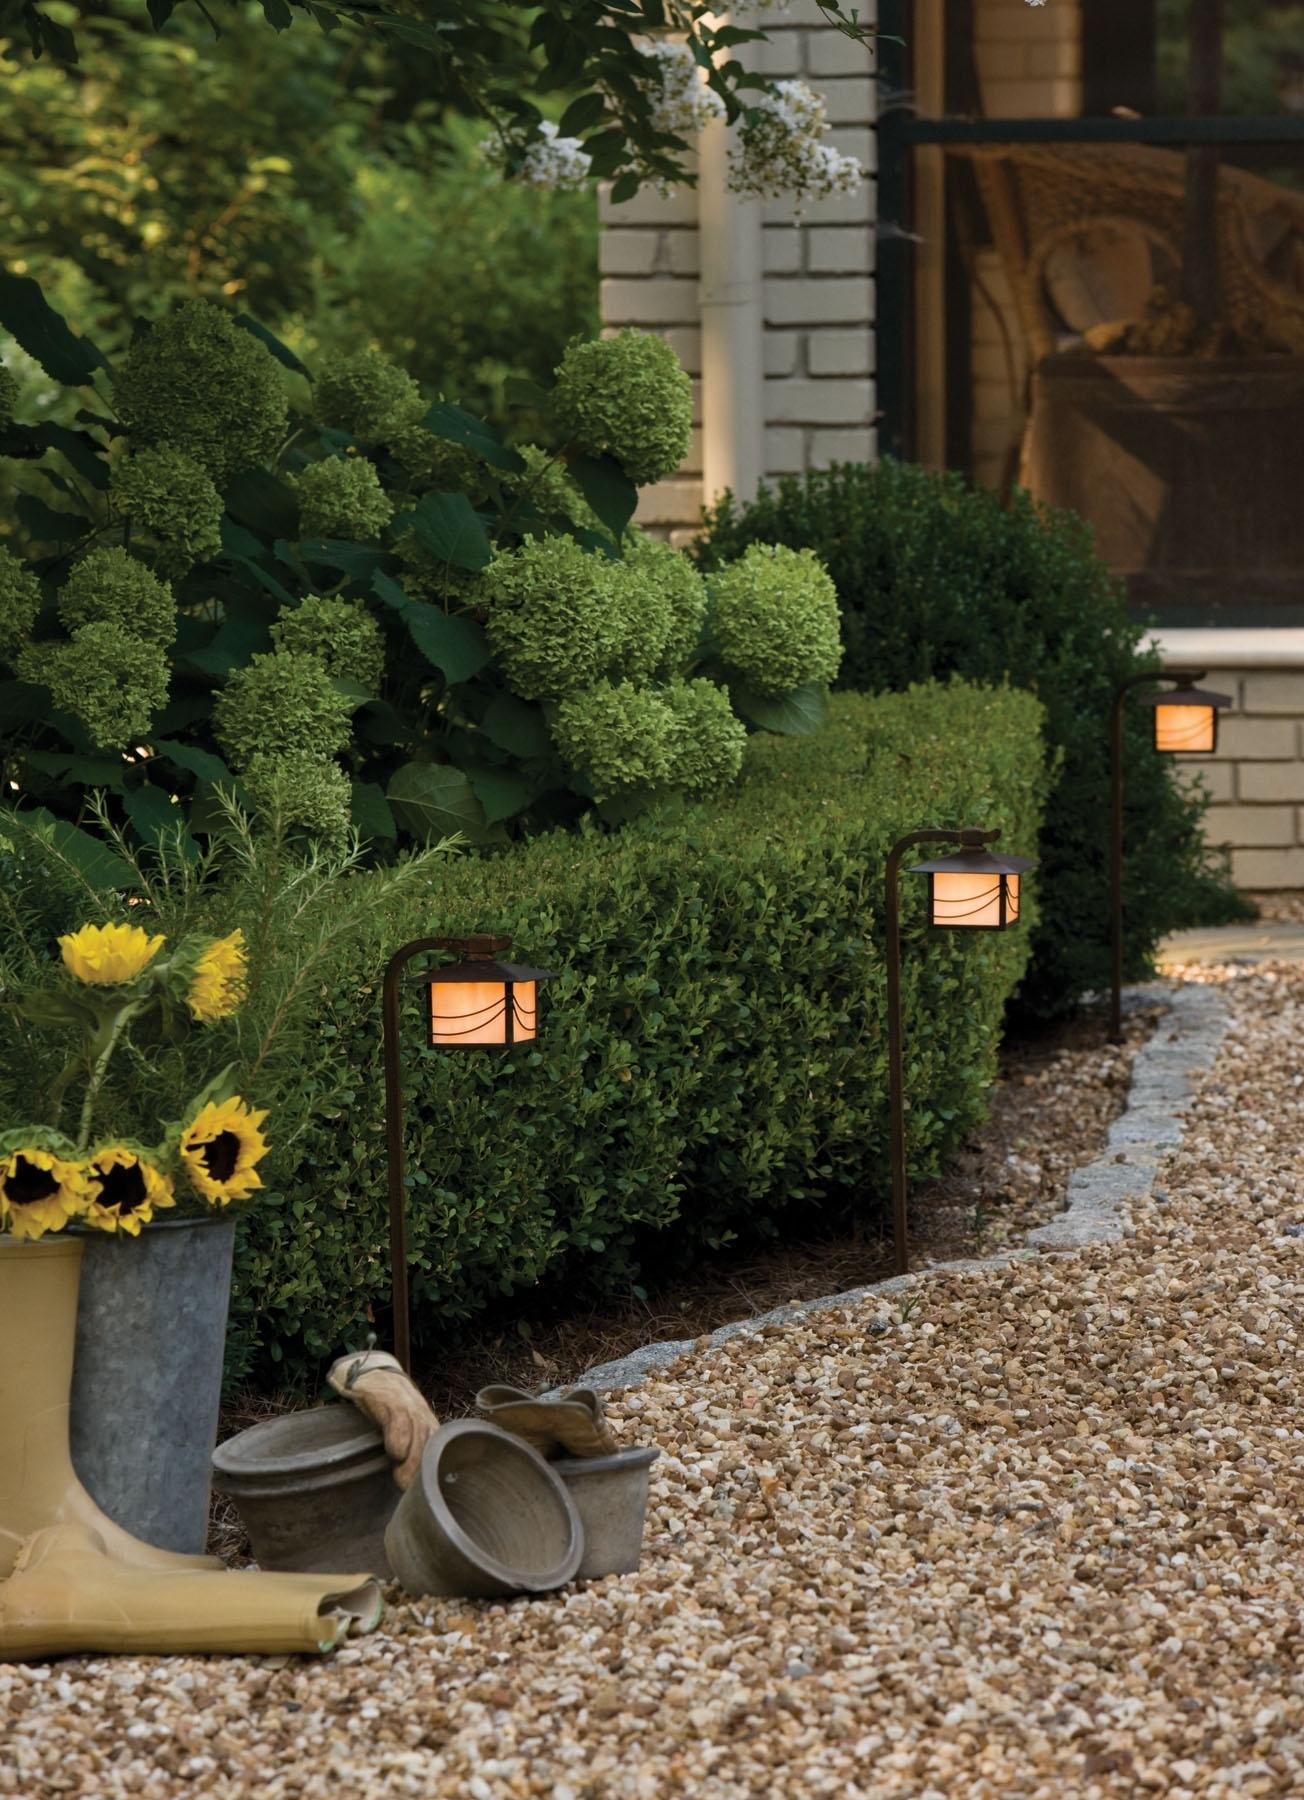 Outdoor, Landscape Lighting, Led Path Lights | House Of Lights Throughout Modern Garden Landscape Hinkley Lighting (#14 of 15)